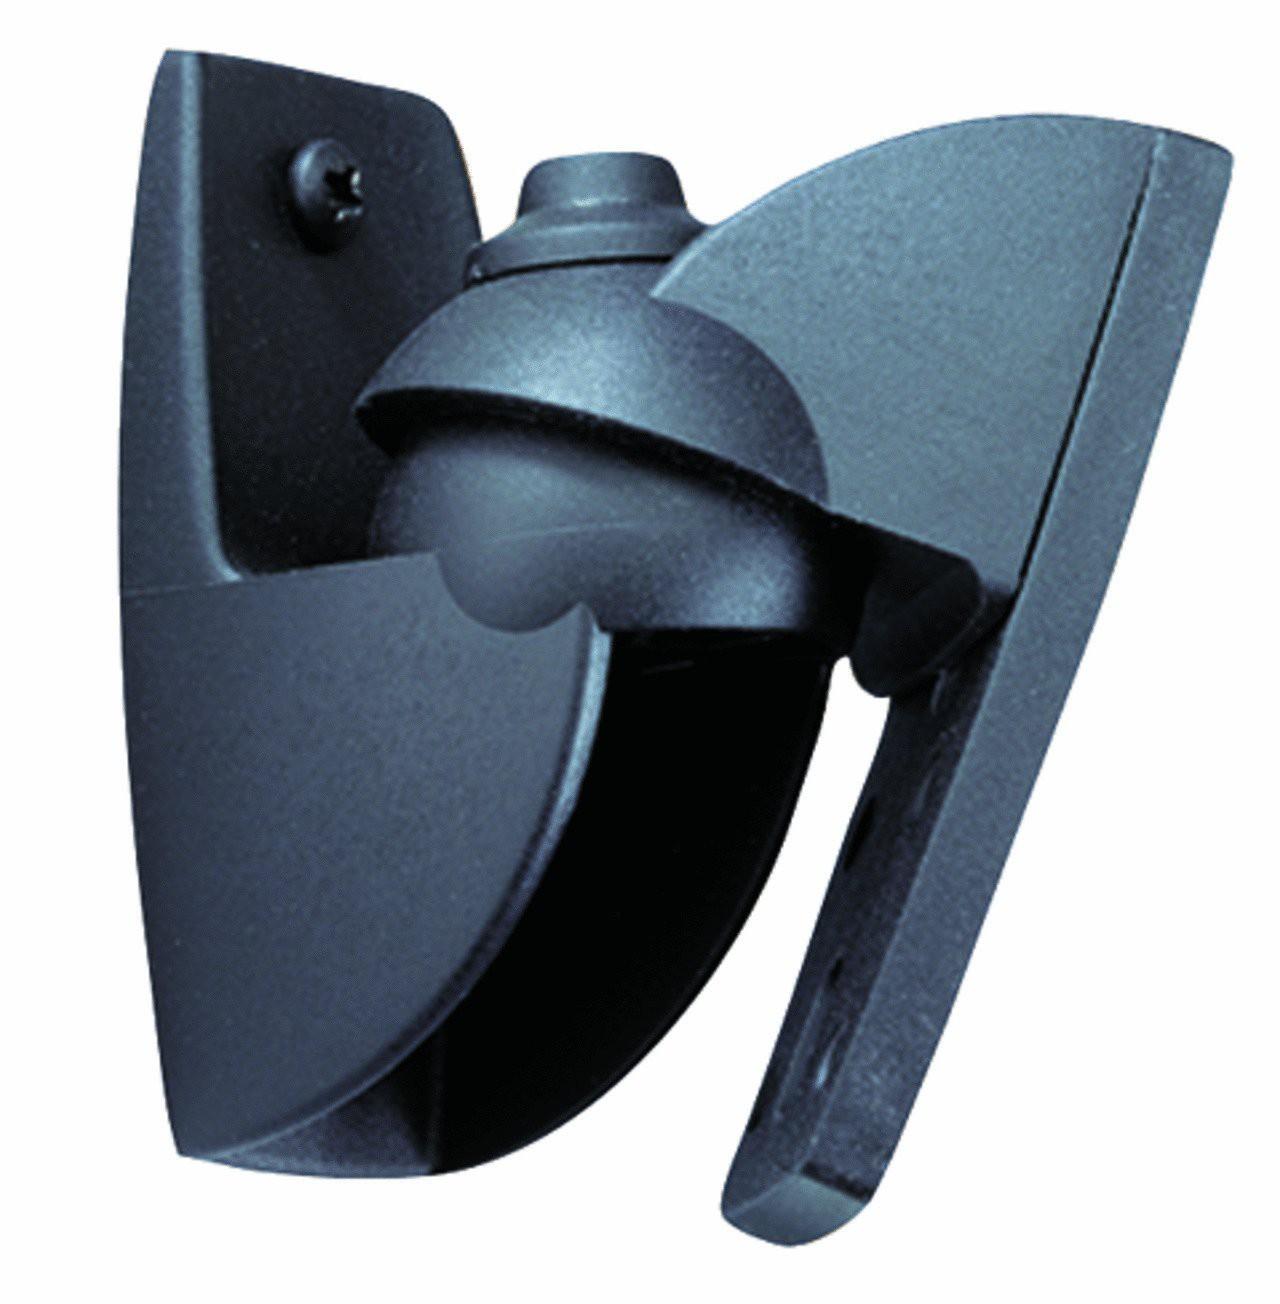 VOGELS VLB 500 B LS-HALTER schwarz 8105000